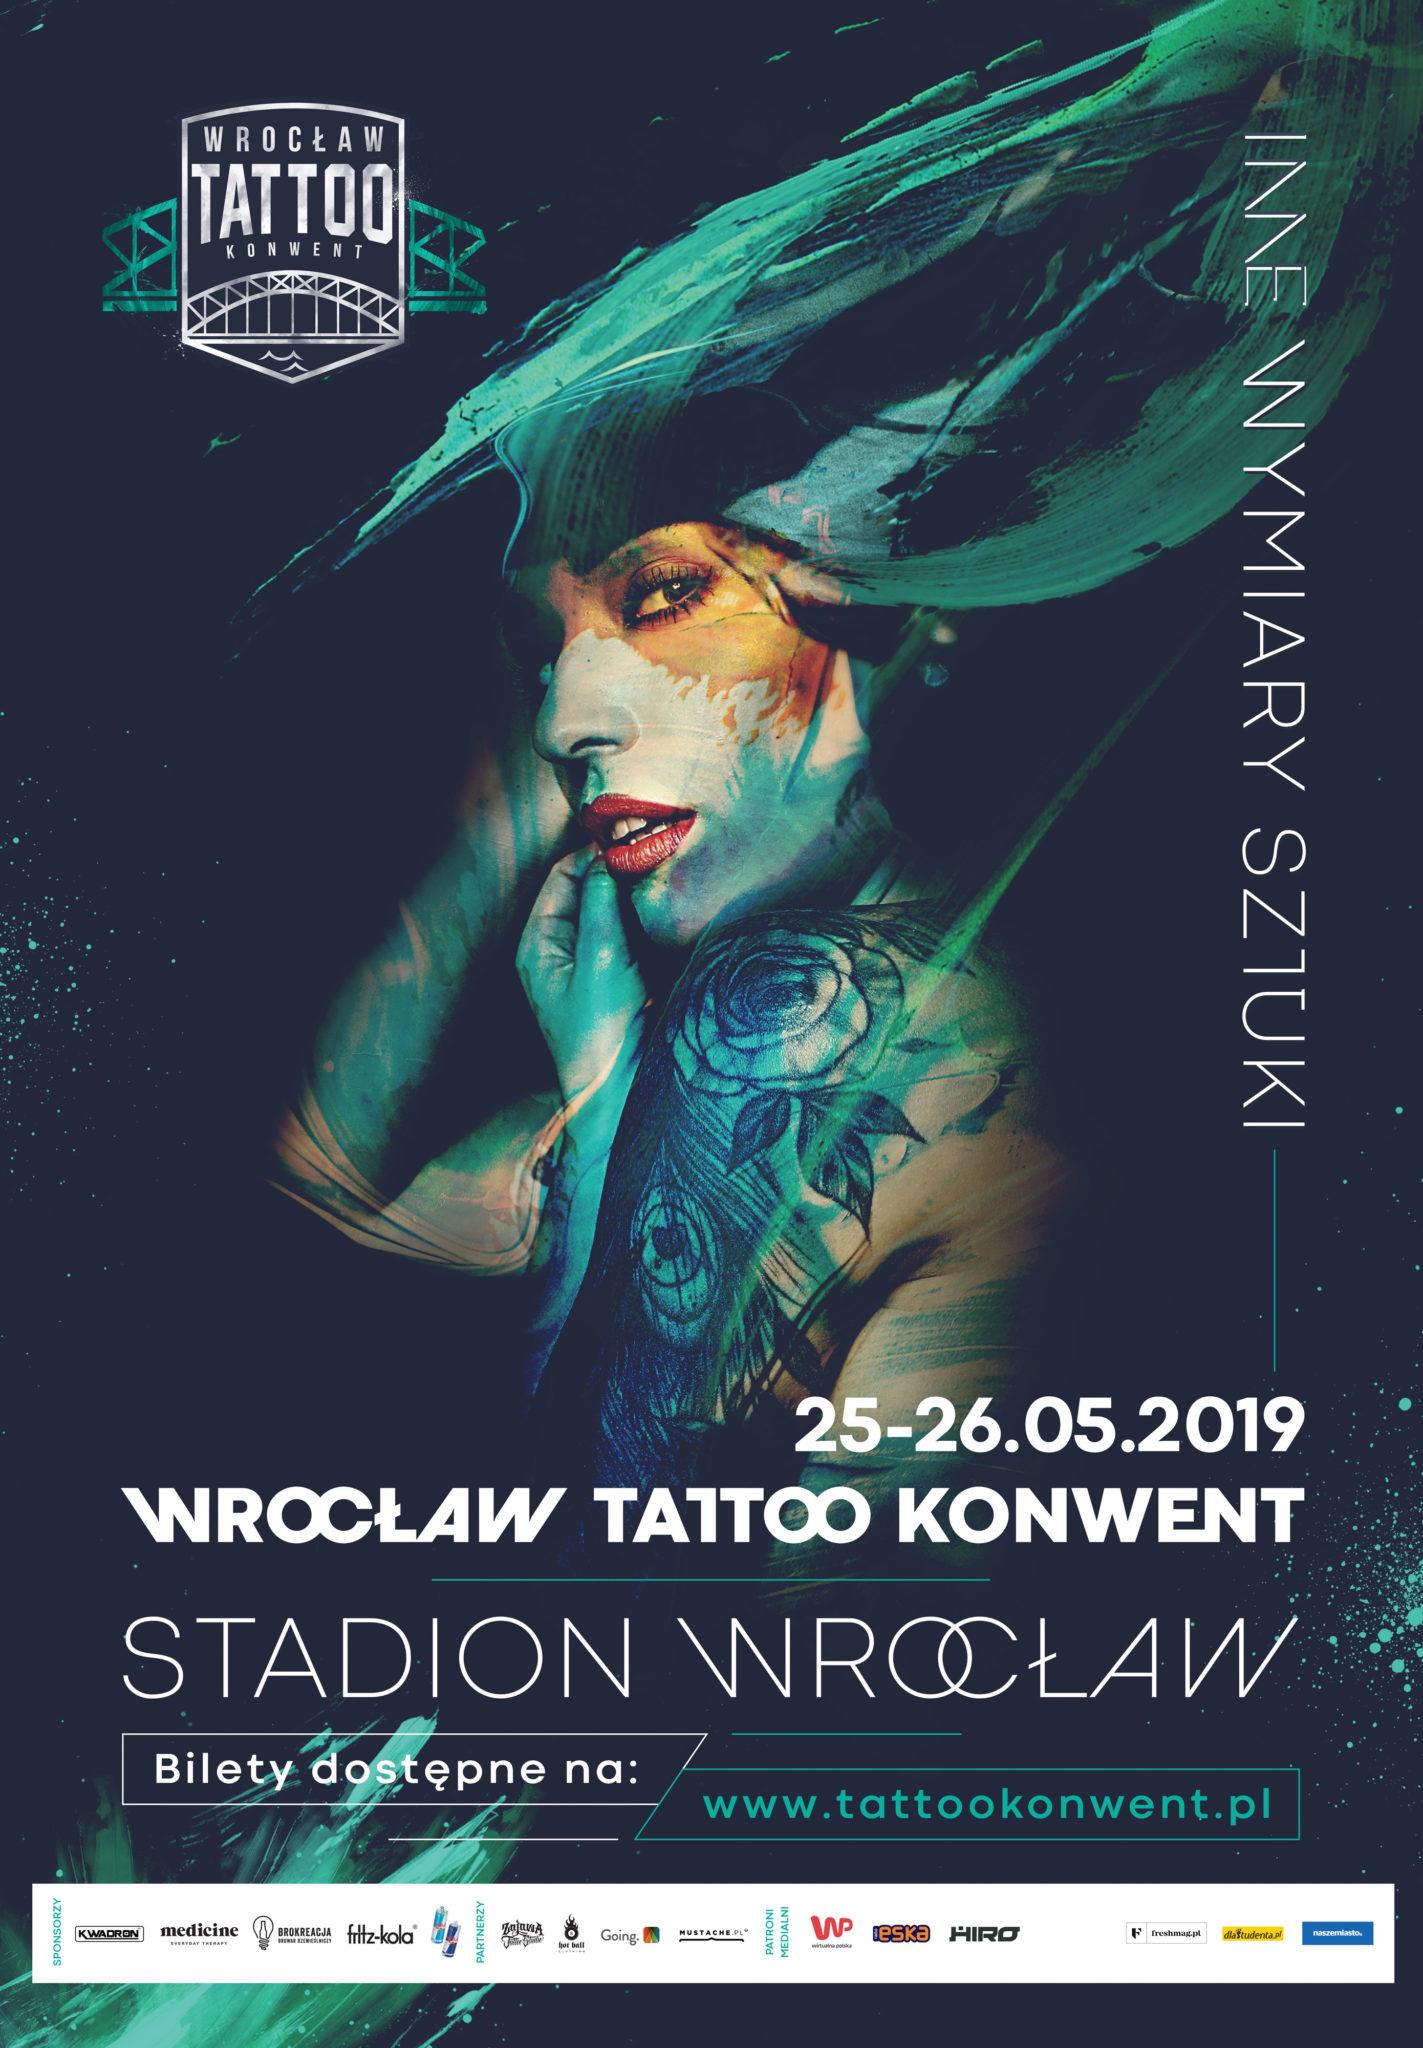 Plakat Wrocław Tattoo Konwent